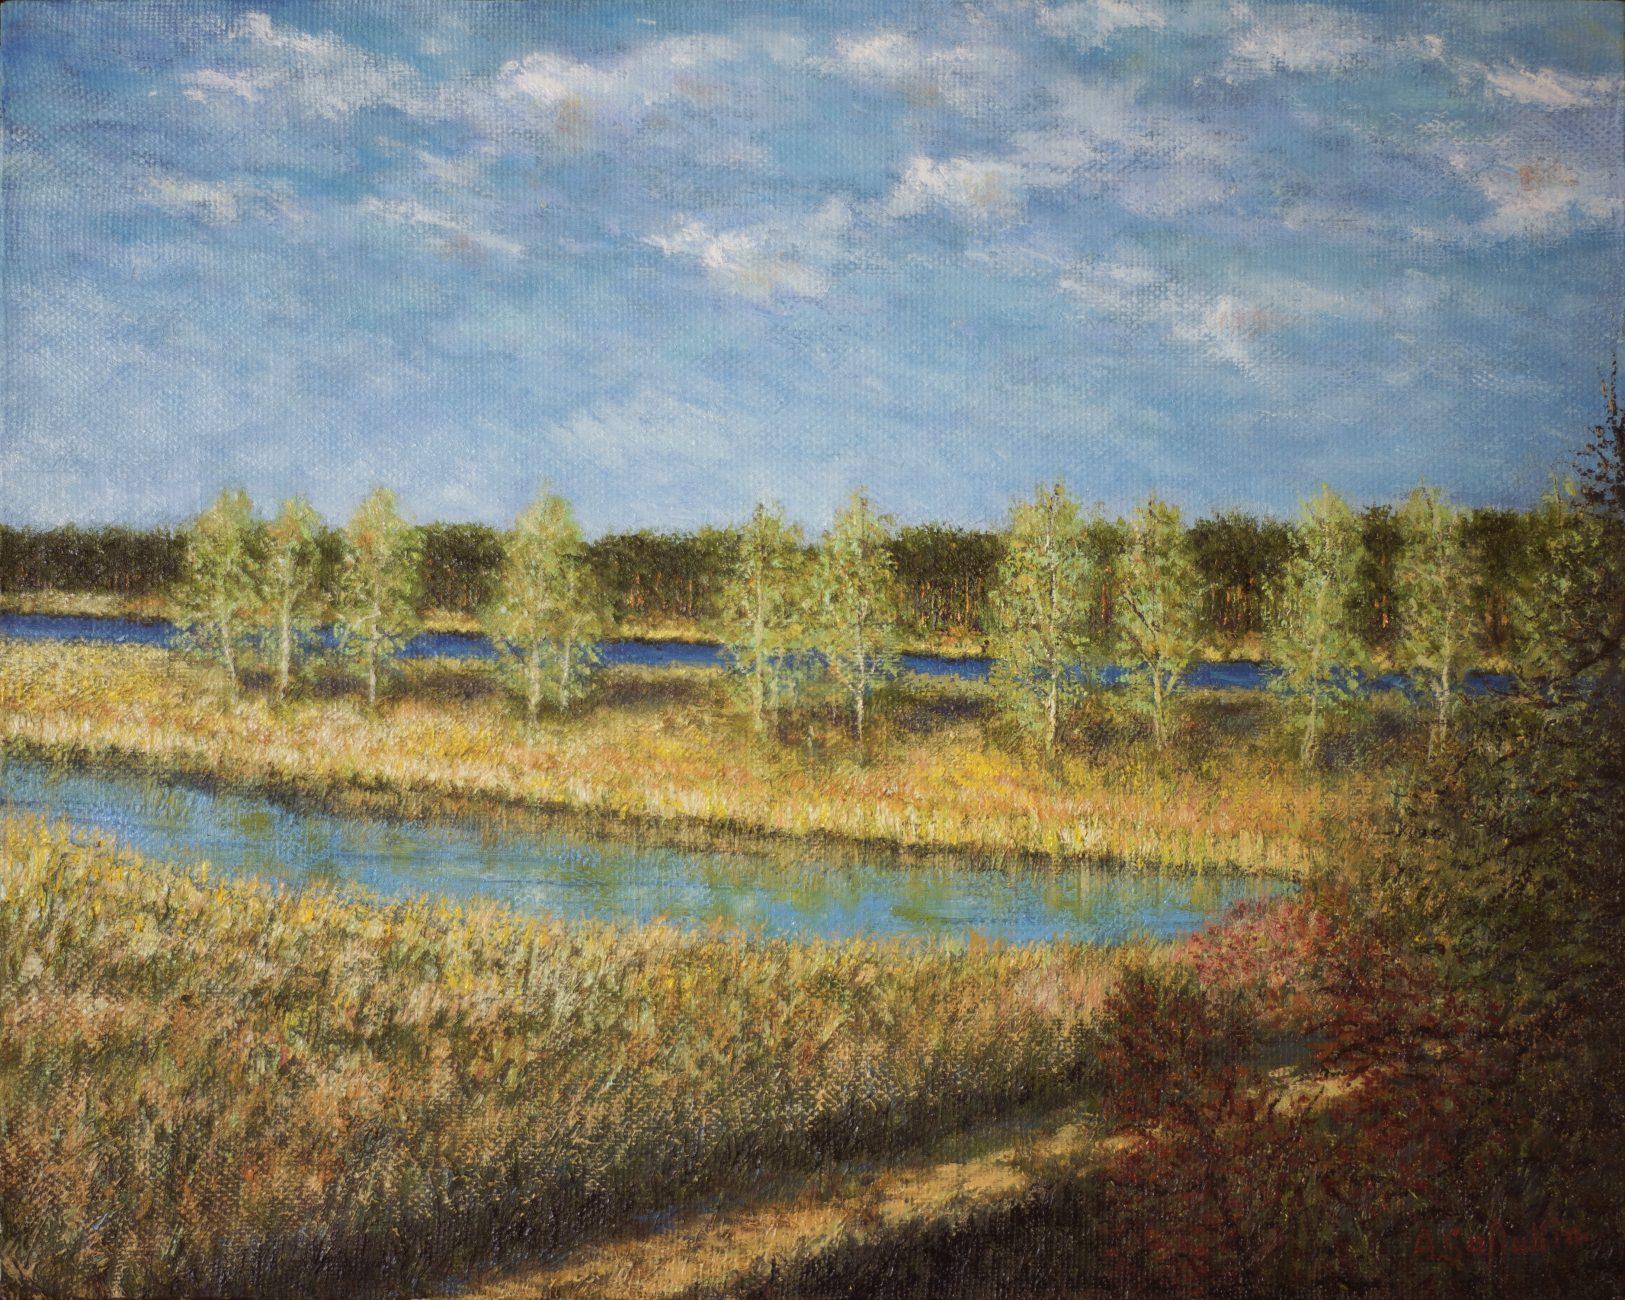 река пейзажи природы Лиелупе Lielupe картина маслом художник Альберт Сафиуллин